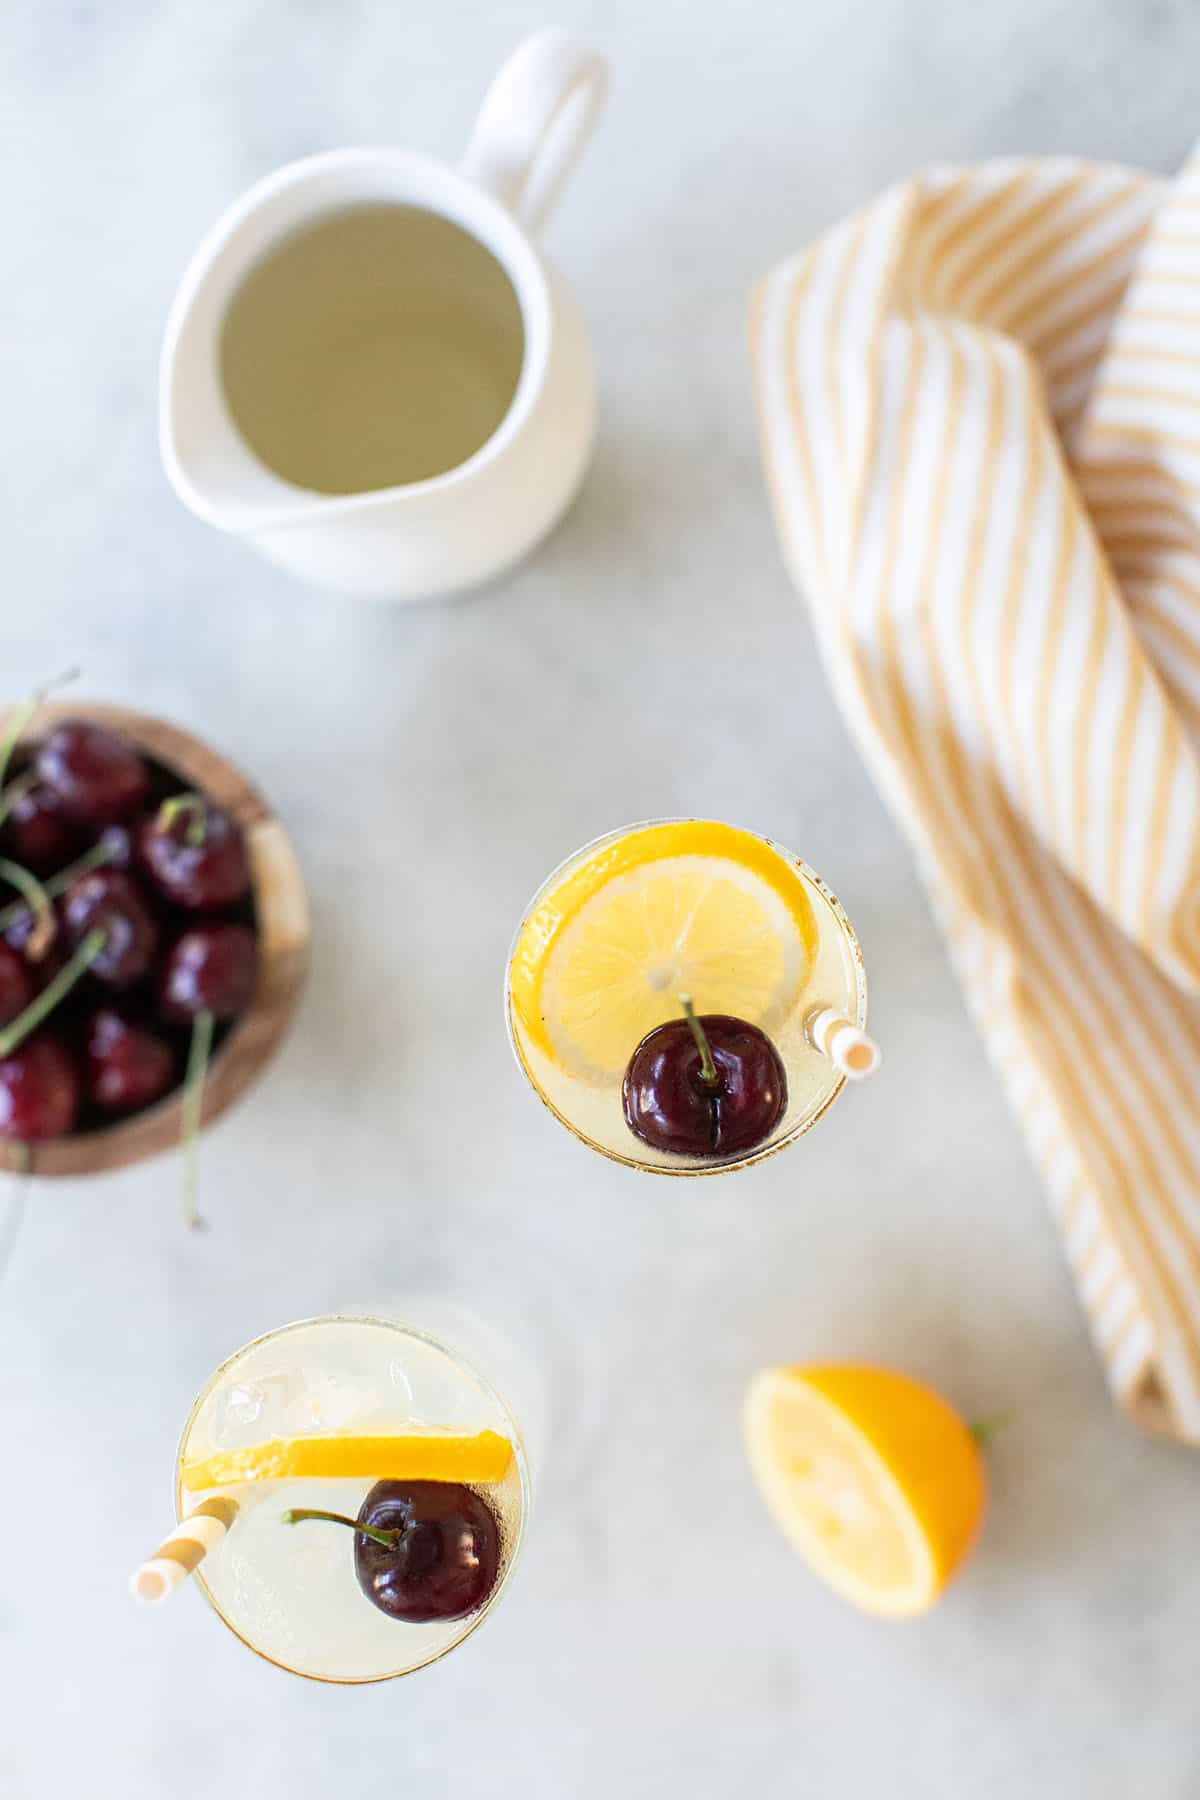 Cocktails with lemon slice